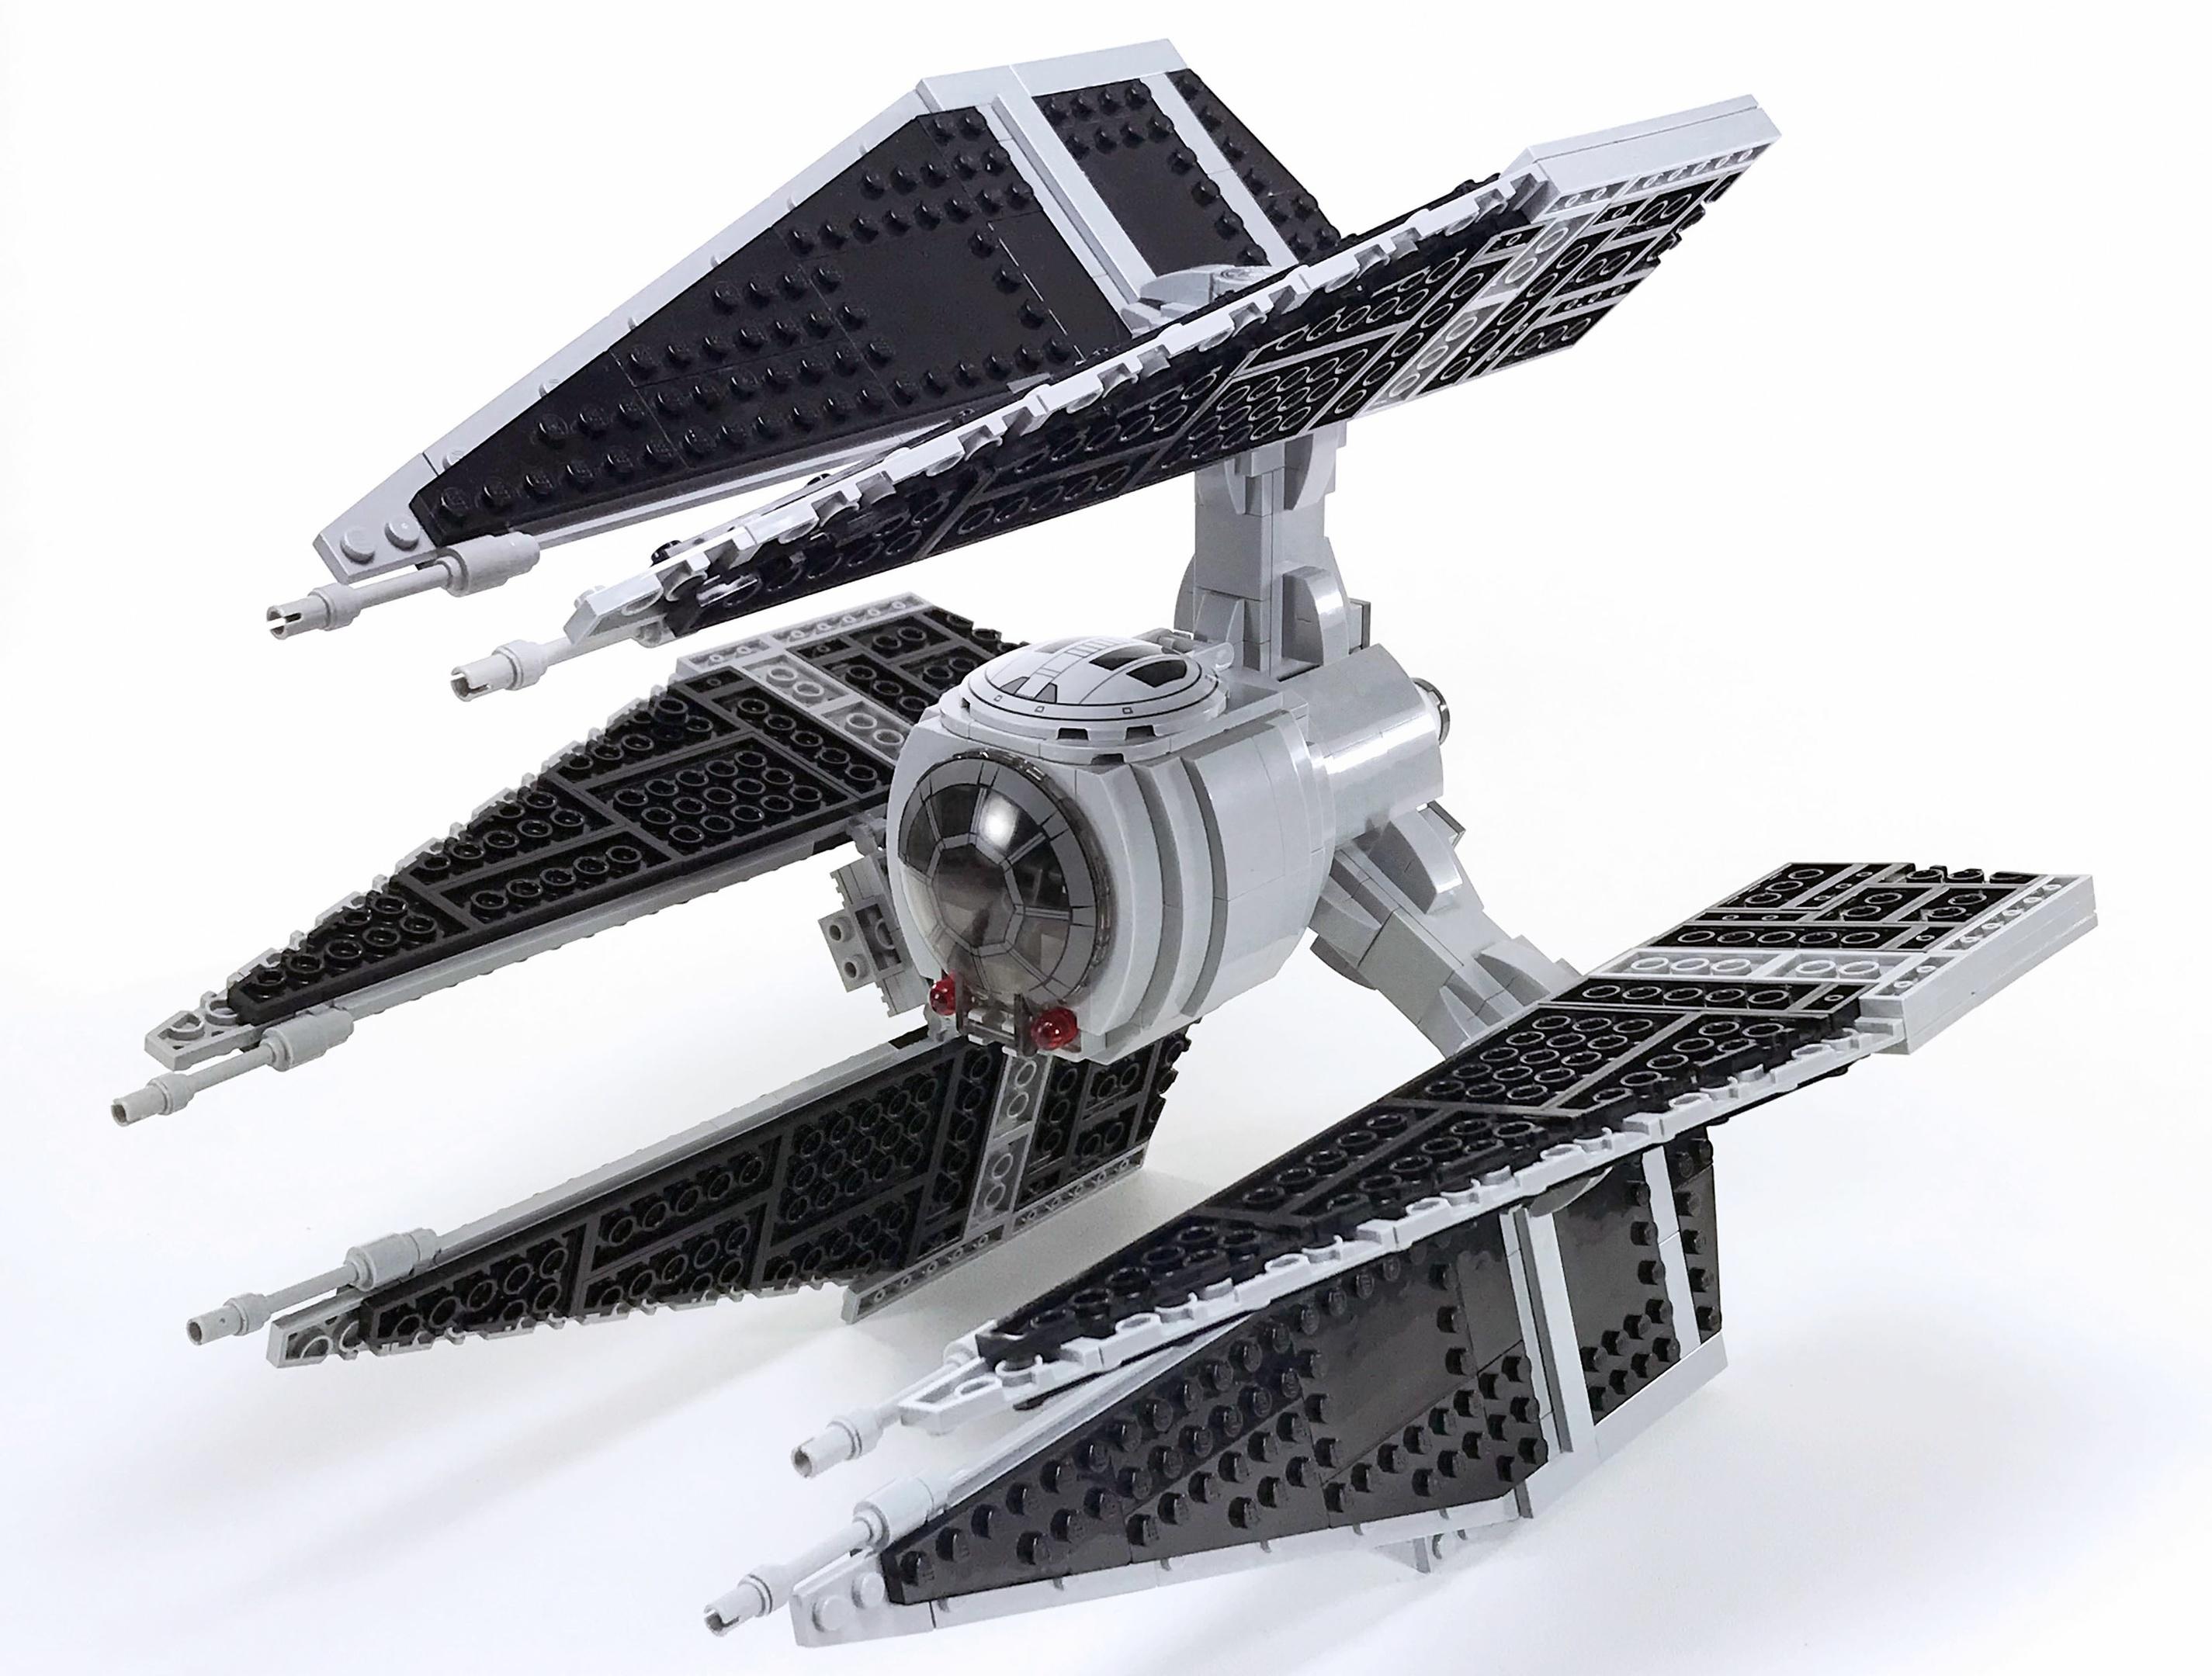 LEGO TIE Defender Instructions